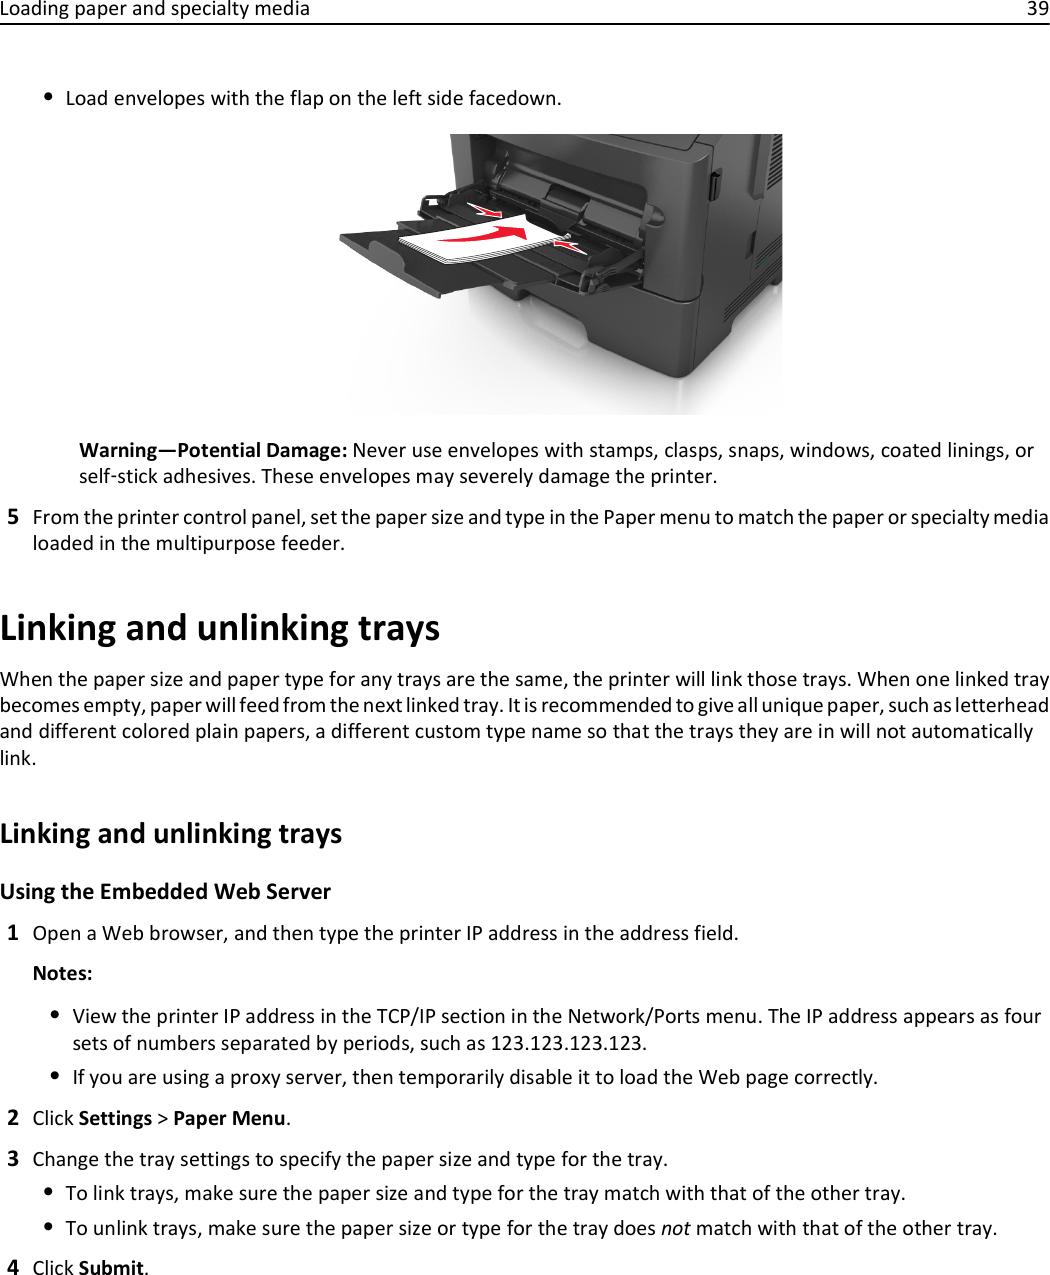 Dell B2360Dn Mono Laser Users Manual ManualsLib Makes It